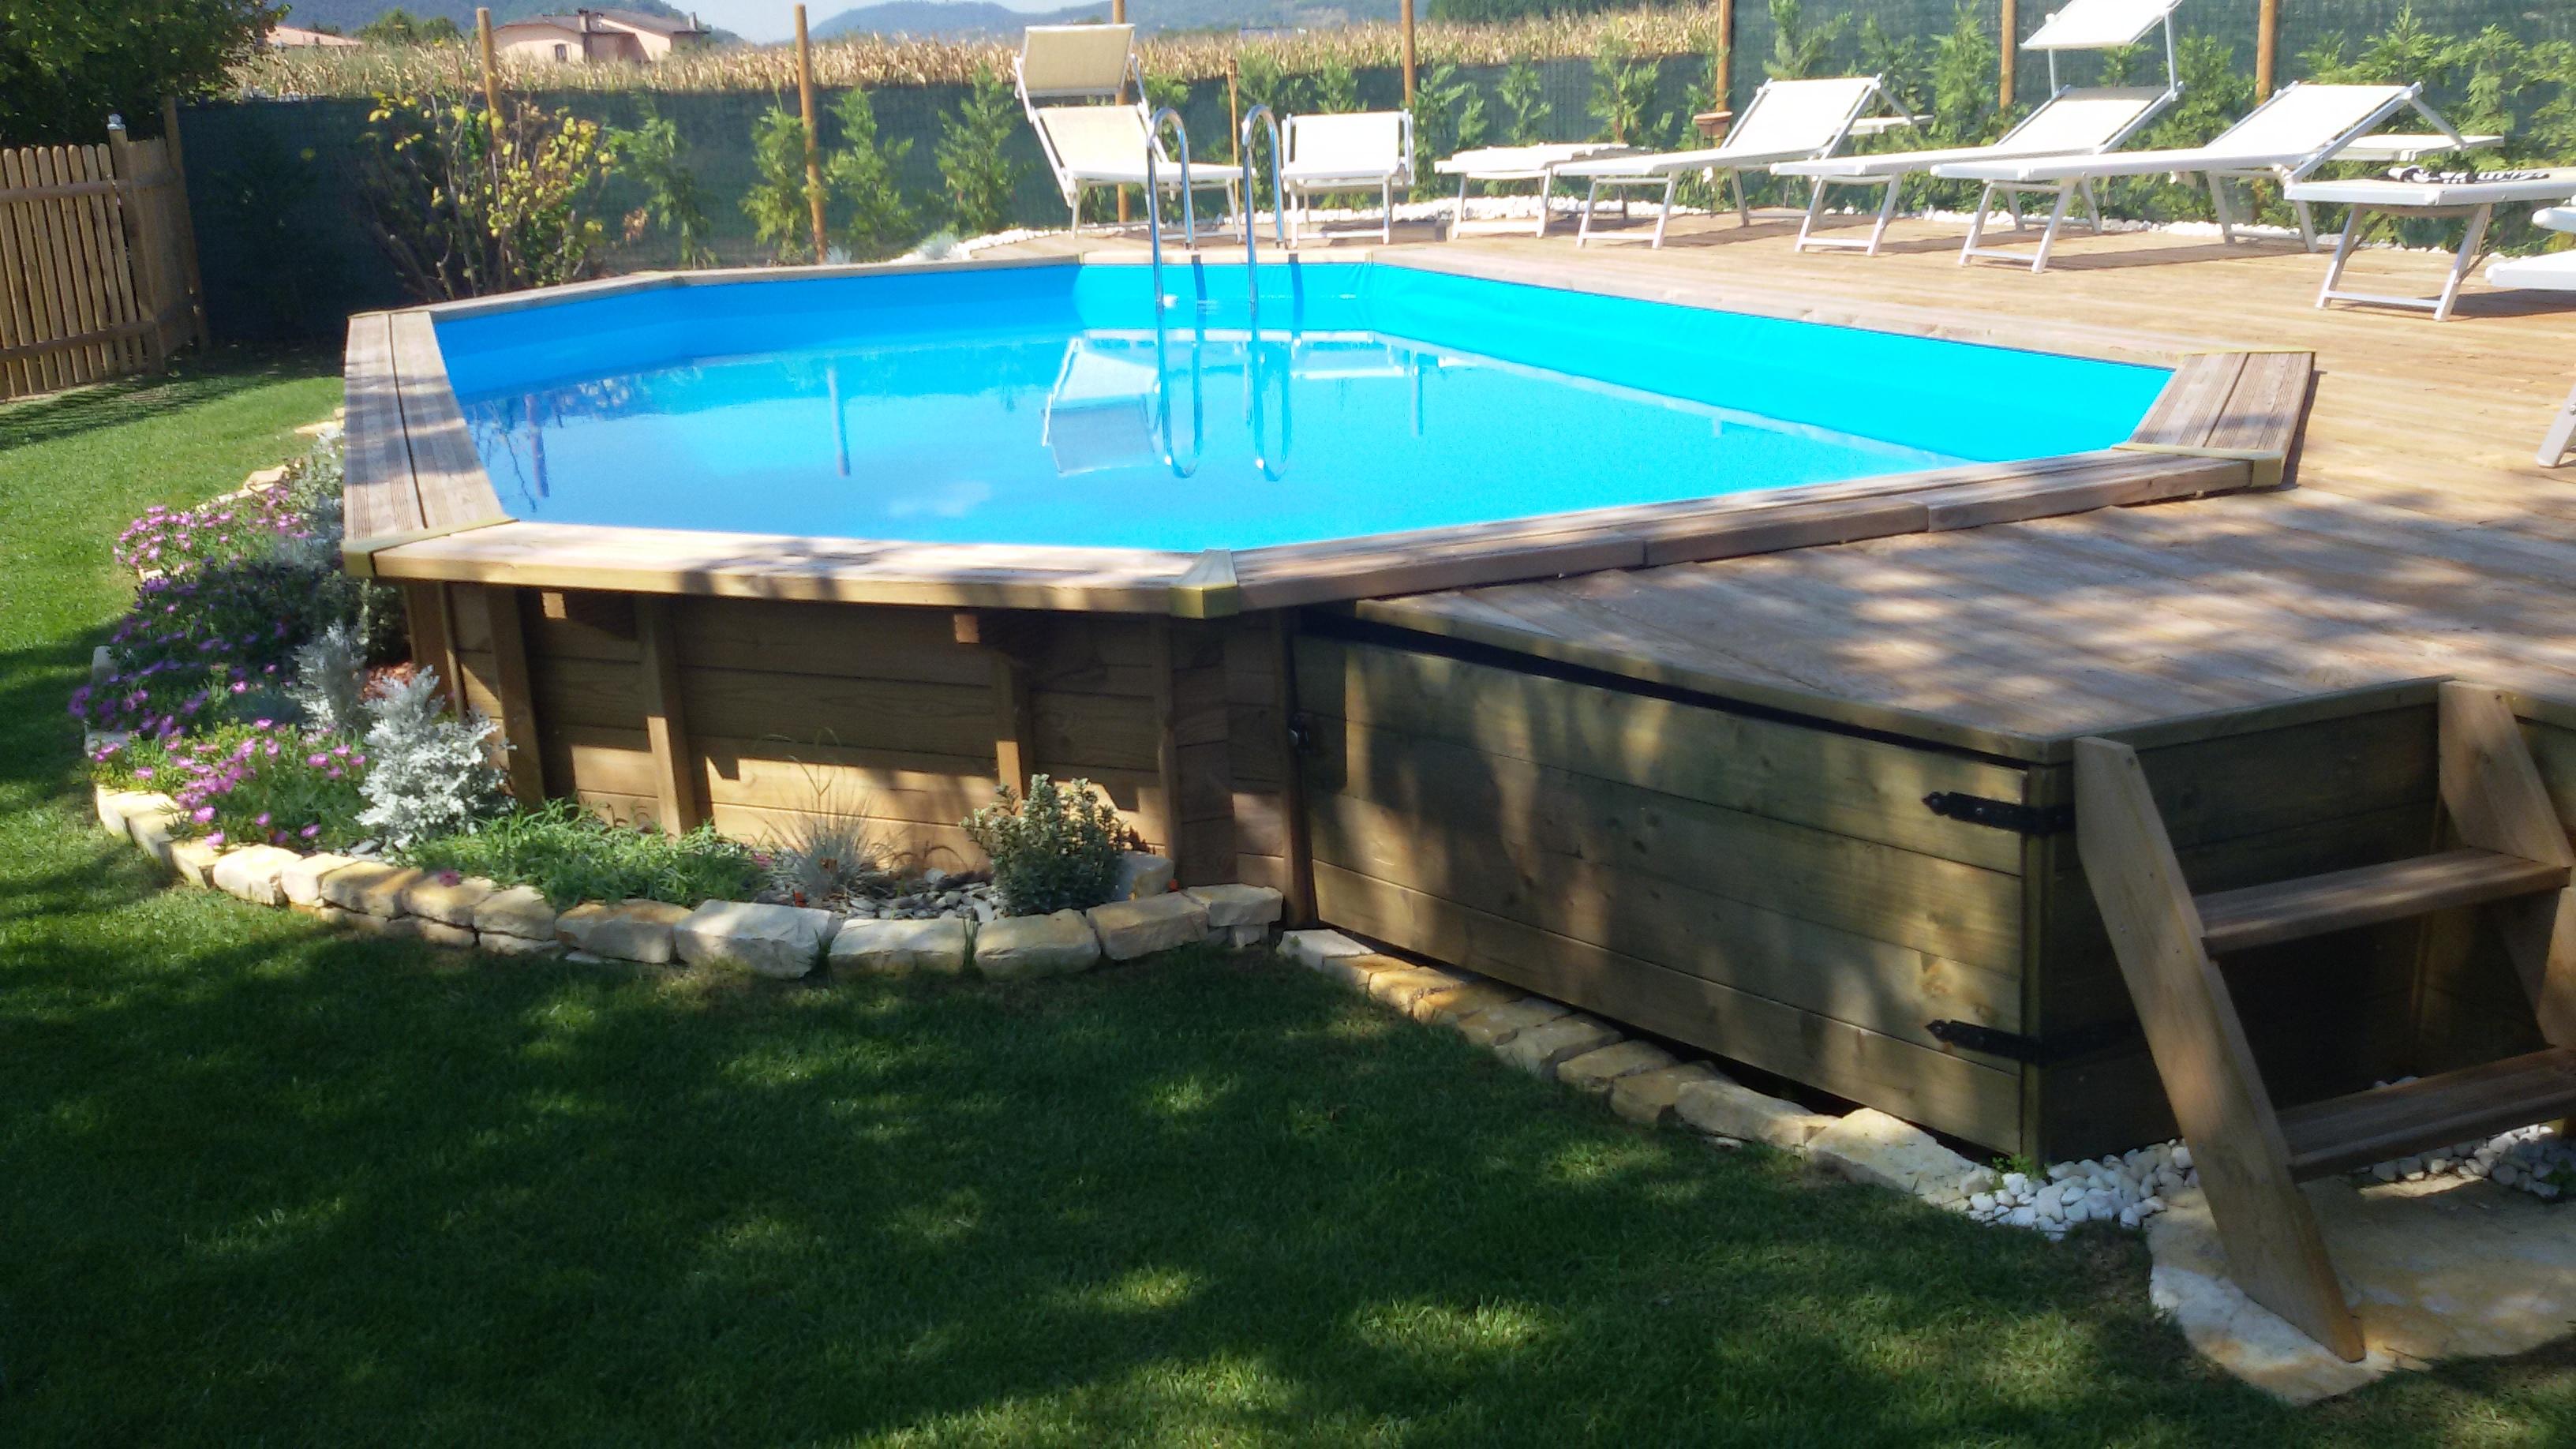 affittacamere nei colli euganei con piscina